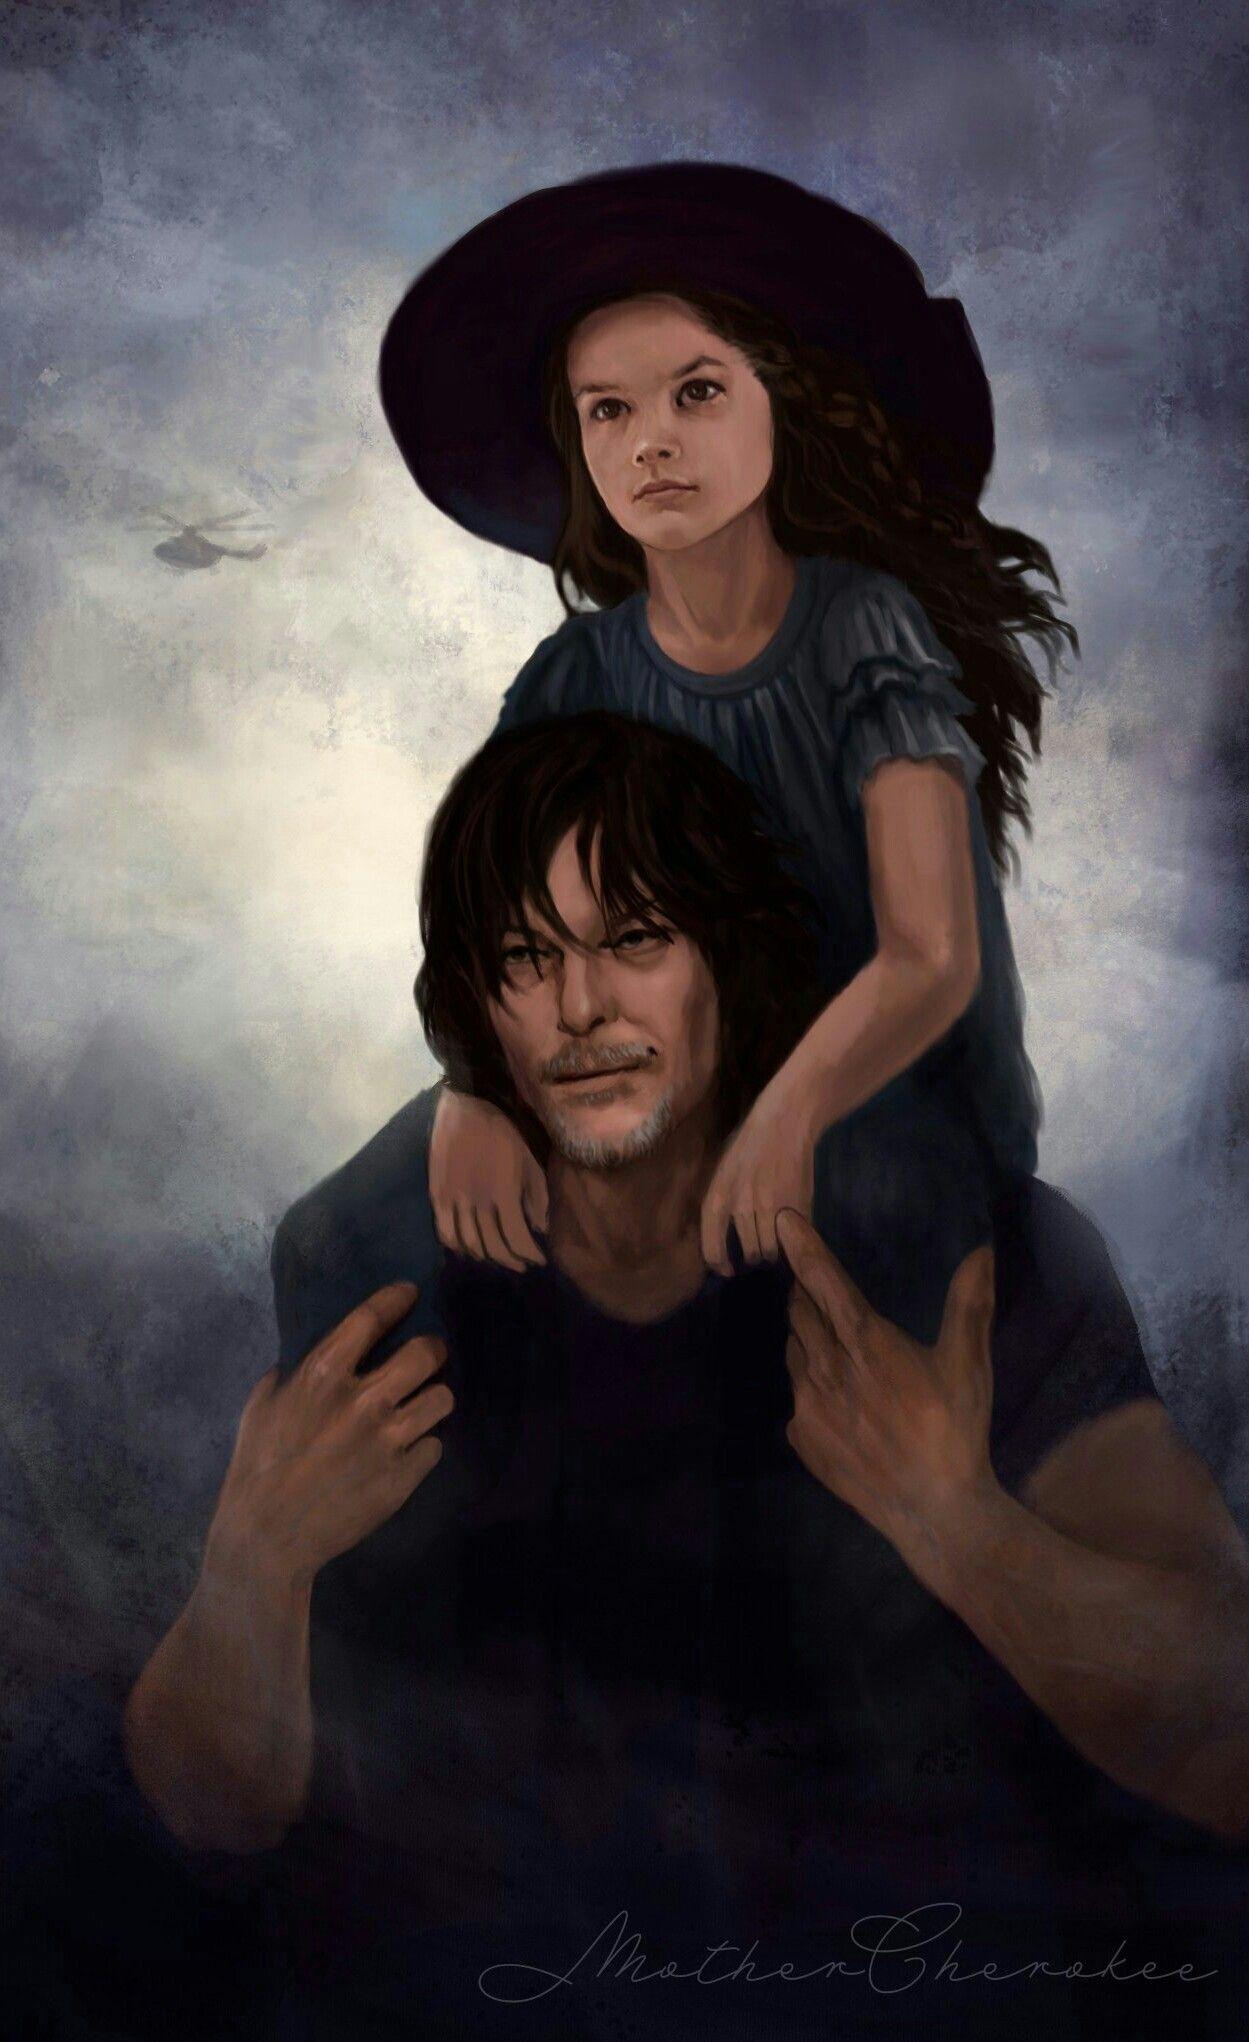 Daryl Dixon And Judith Grimes In 2020 Walking Dead Fan Art Walking Dead Wallpaper Daryl Dixon Walking Dead